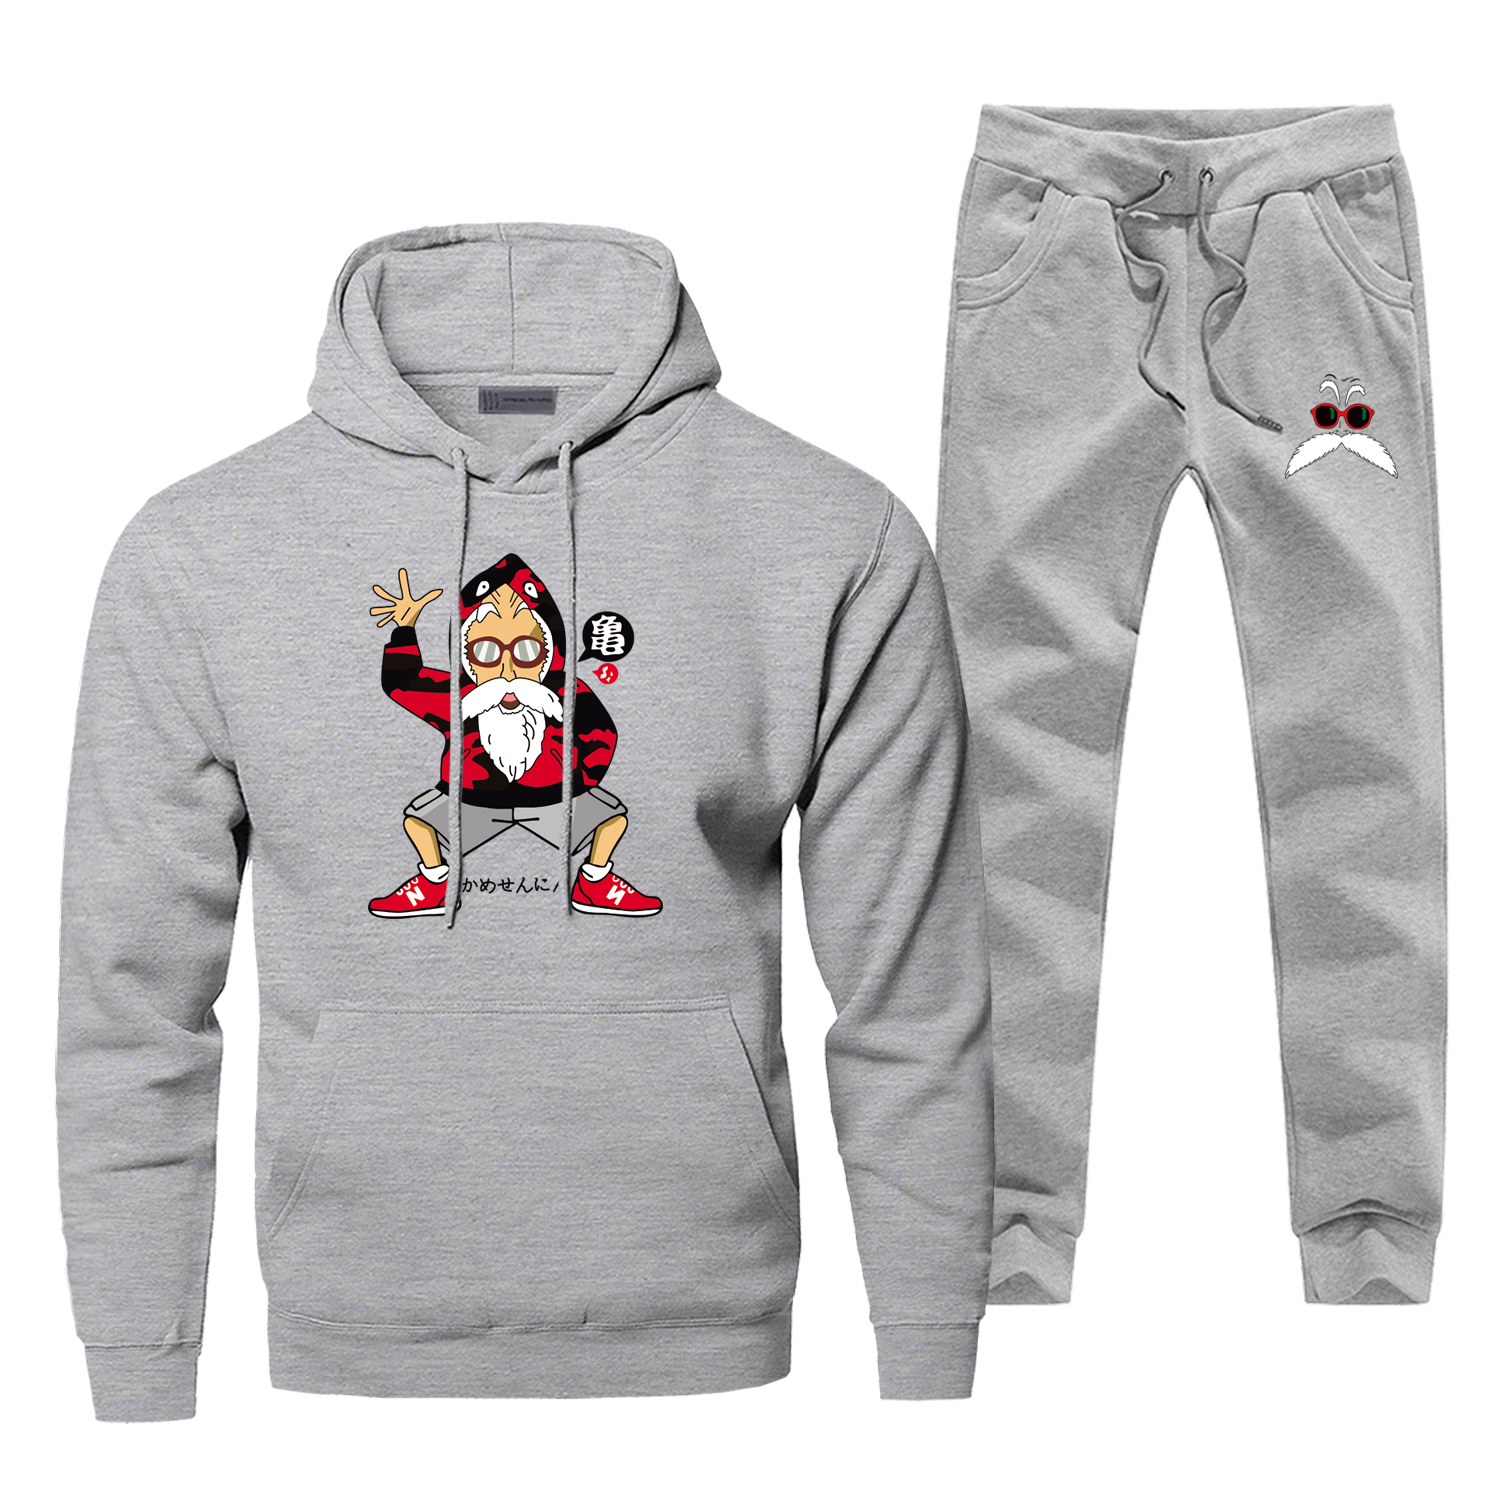 Dragon Ball Hoodies Pant Set Men Master Roshi Sets Japan Anime Sweatshirt Sweatpants Sportswear Autumn Pullover 2 PCS Tracksuit